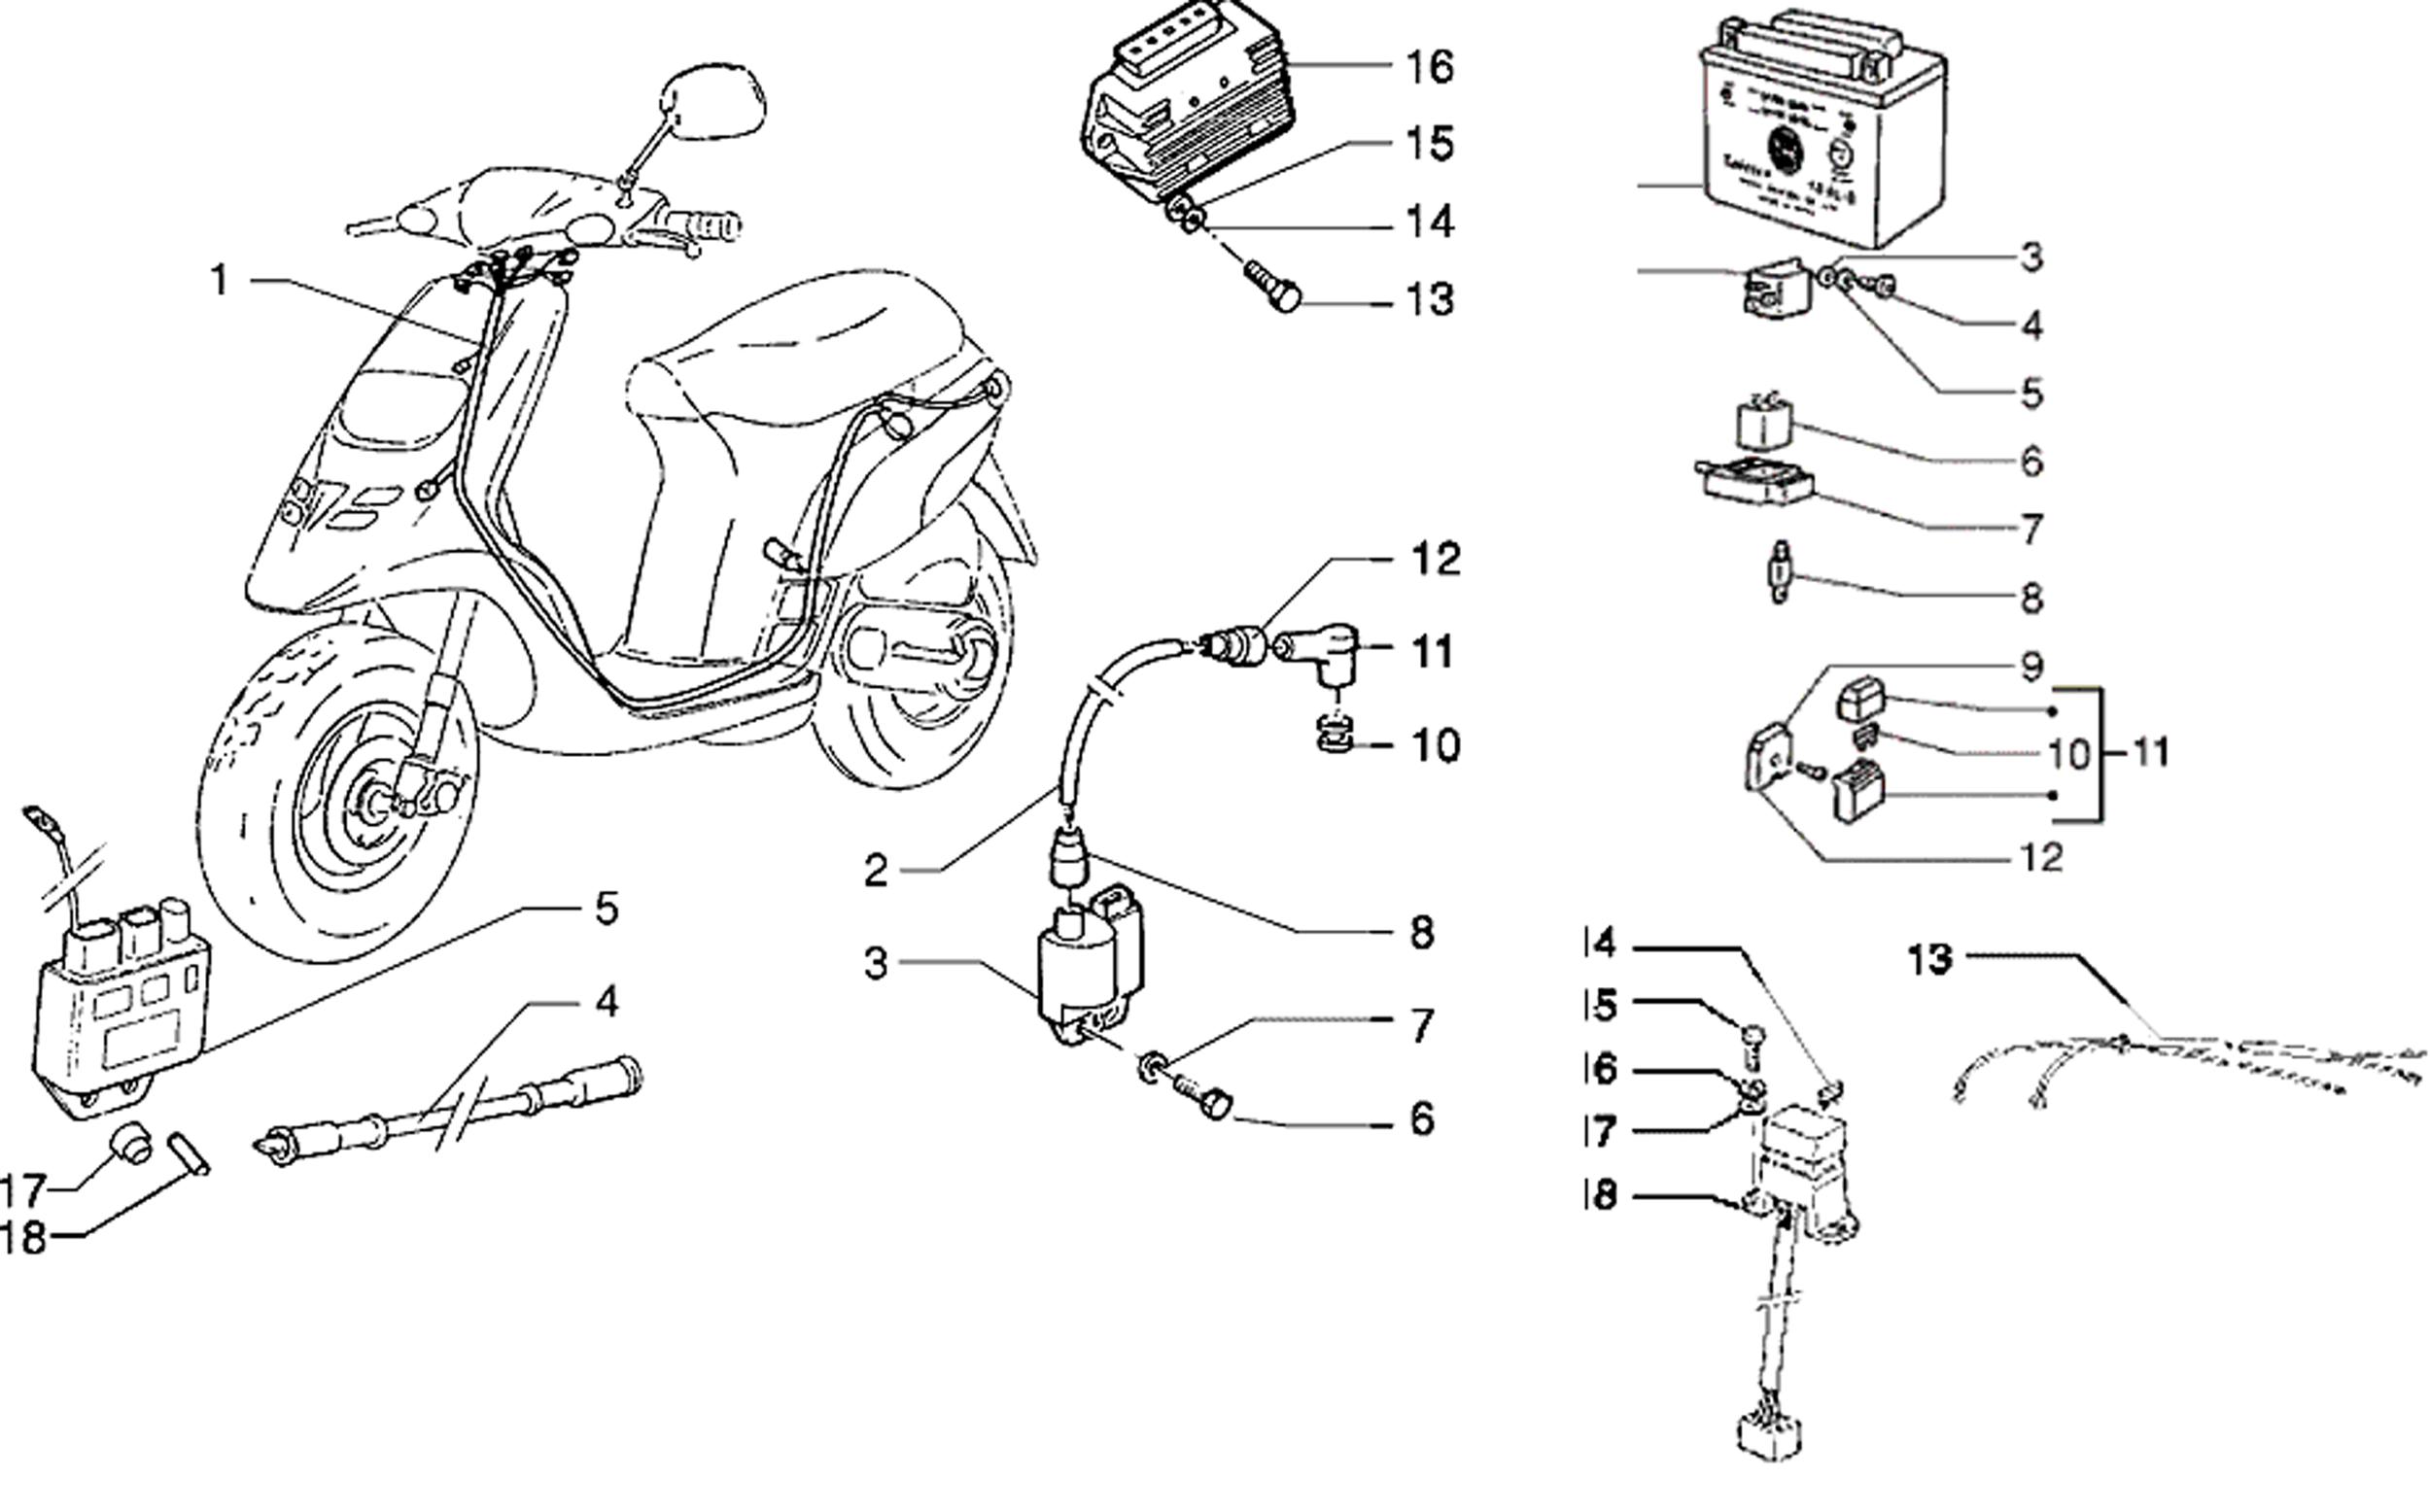 piaggio fly 125 manual pdf